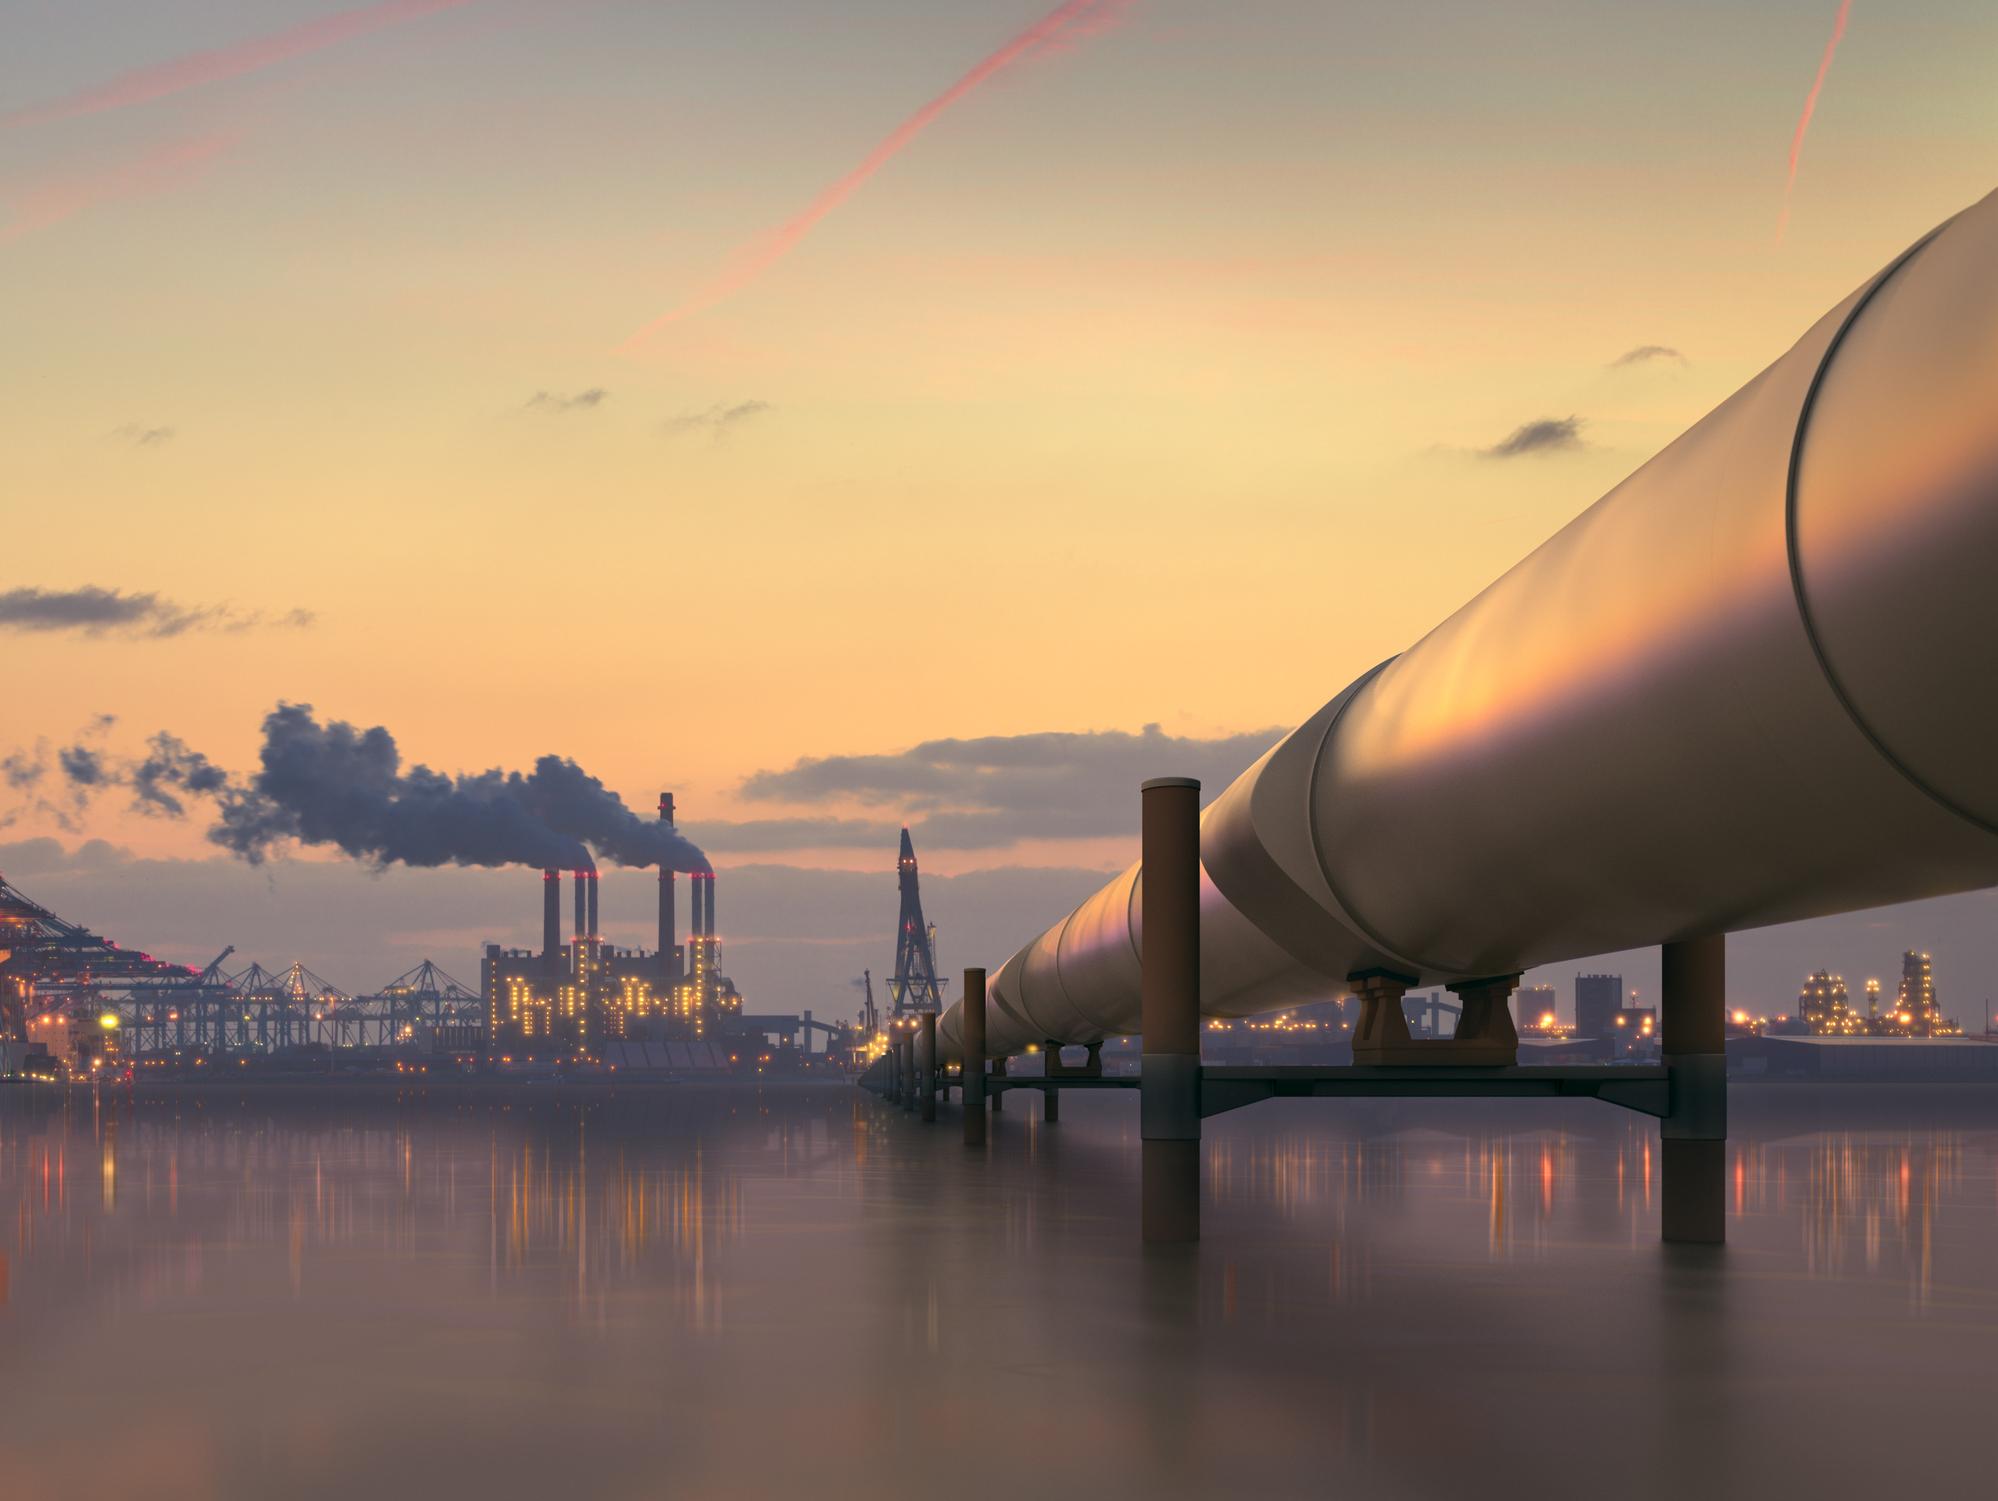 Pipeline headed into refinery